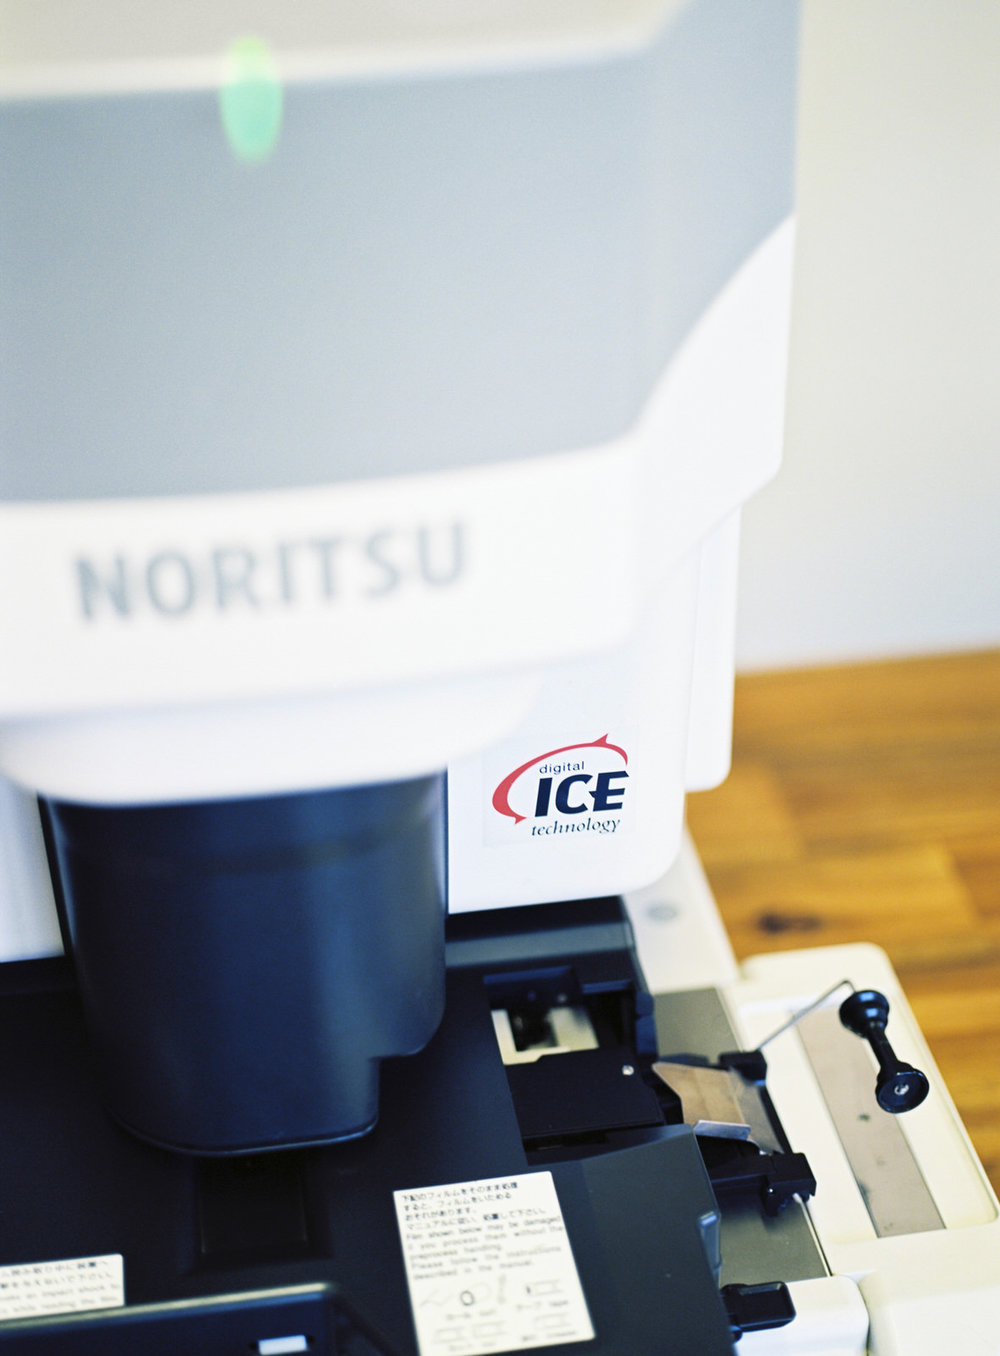 Noritsu - HS-1800